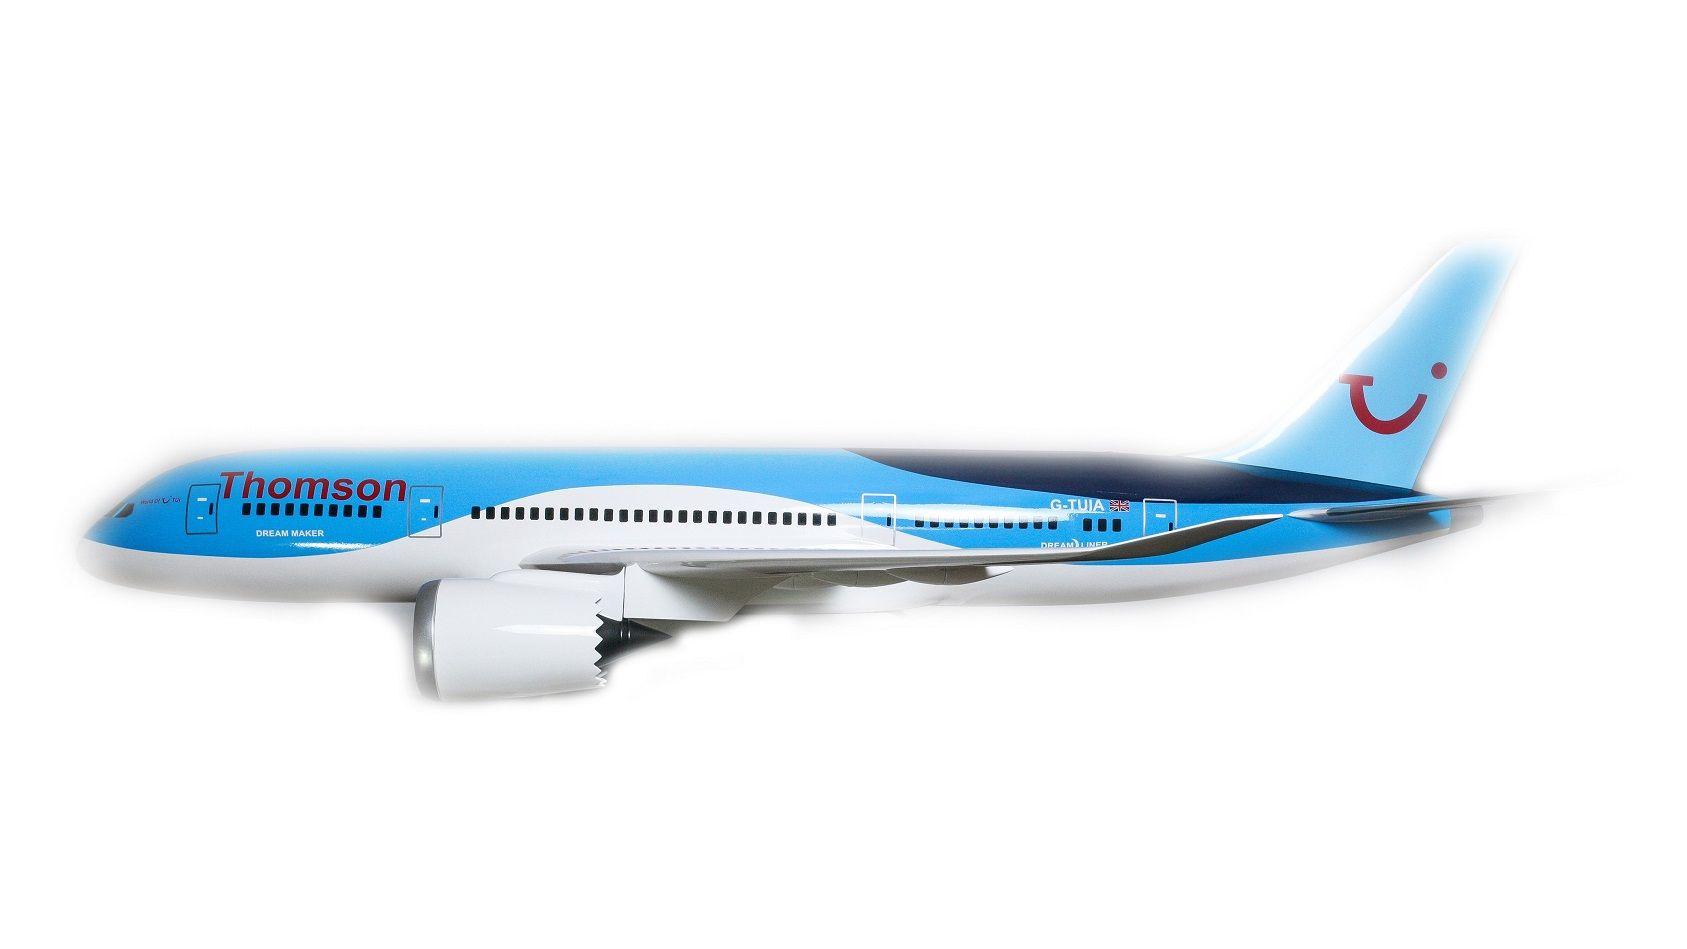 1525-9136-Boeing-787-800-Thomson-Airways-Model-Plane